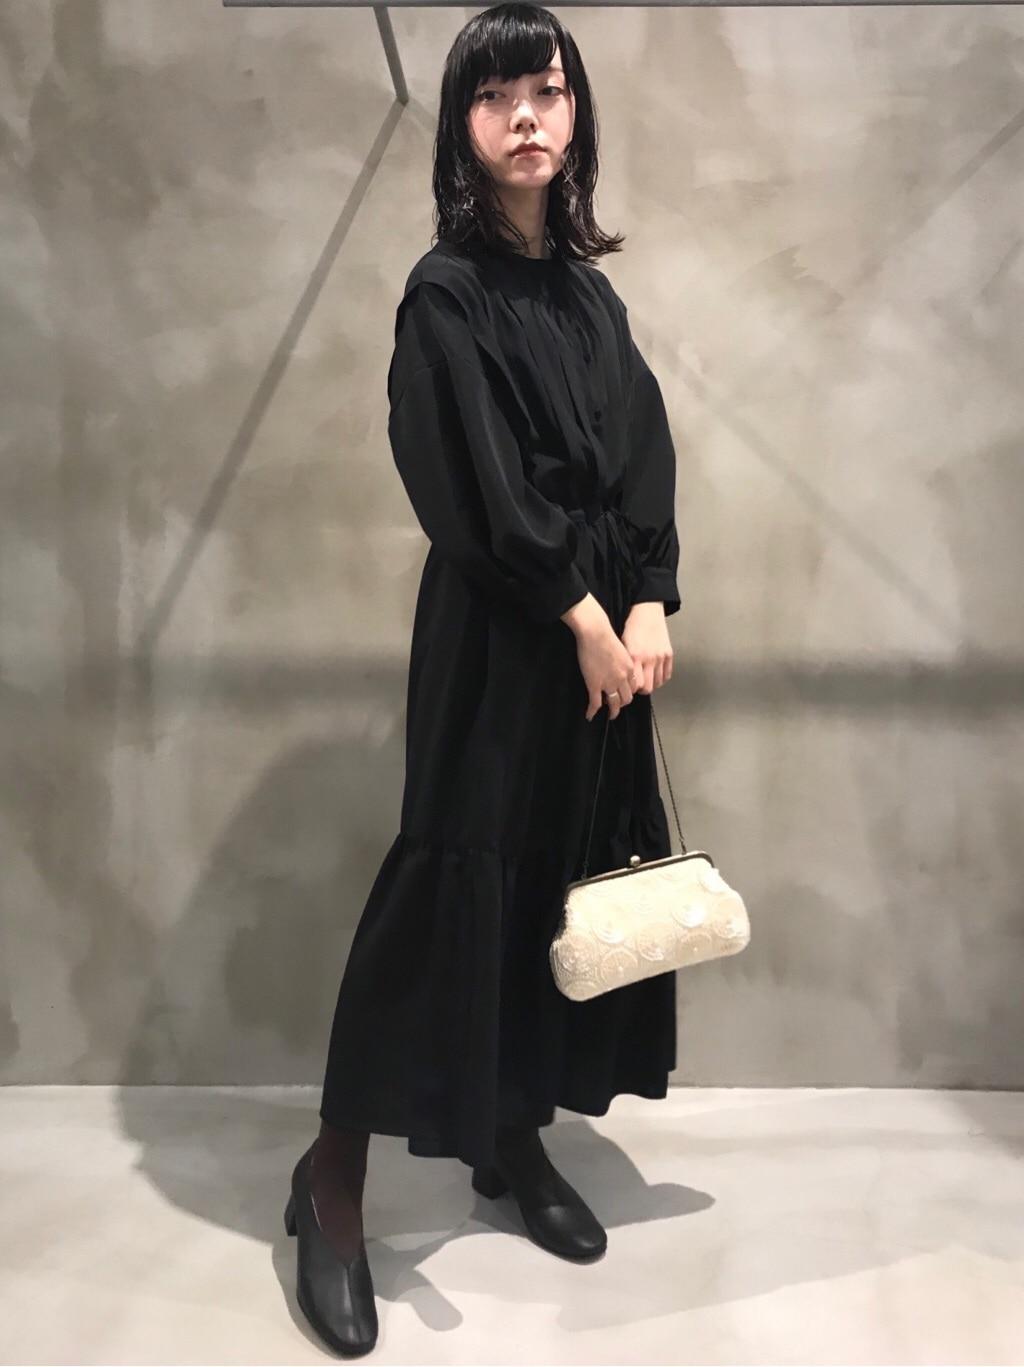 bulle de savon 渋谷スクランブルスクエア 身長:153cm 2020.03.09